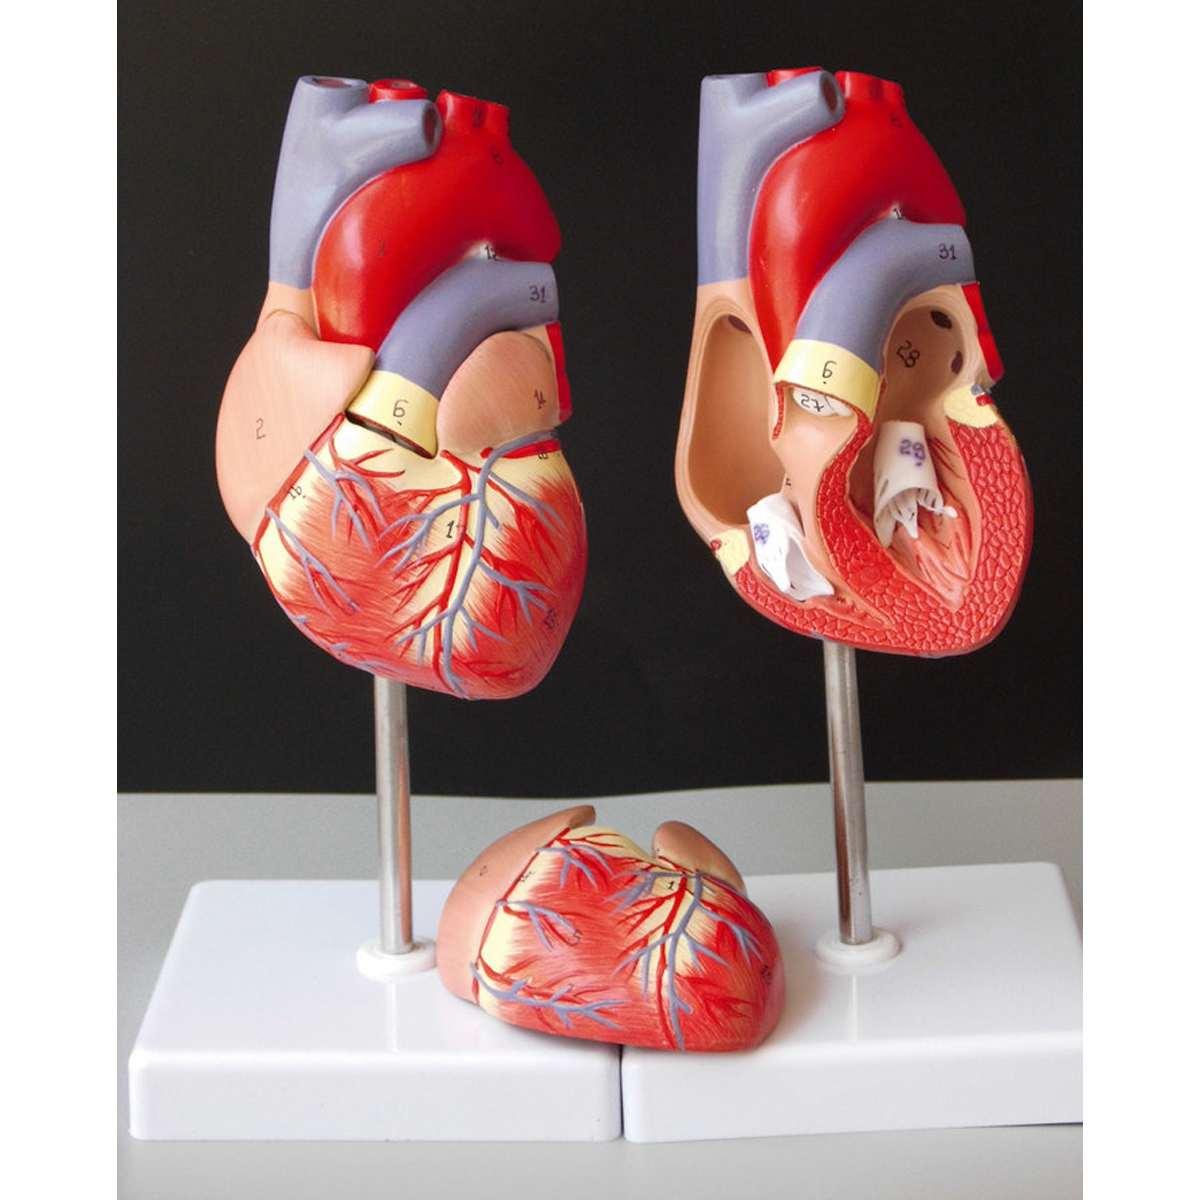 Human Heart Anatomical Anatomy Teaching Model Viscera Medical Organ Model Emulational + Stand Medical Science Teaching Resources